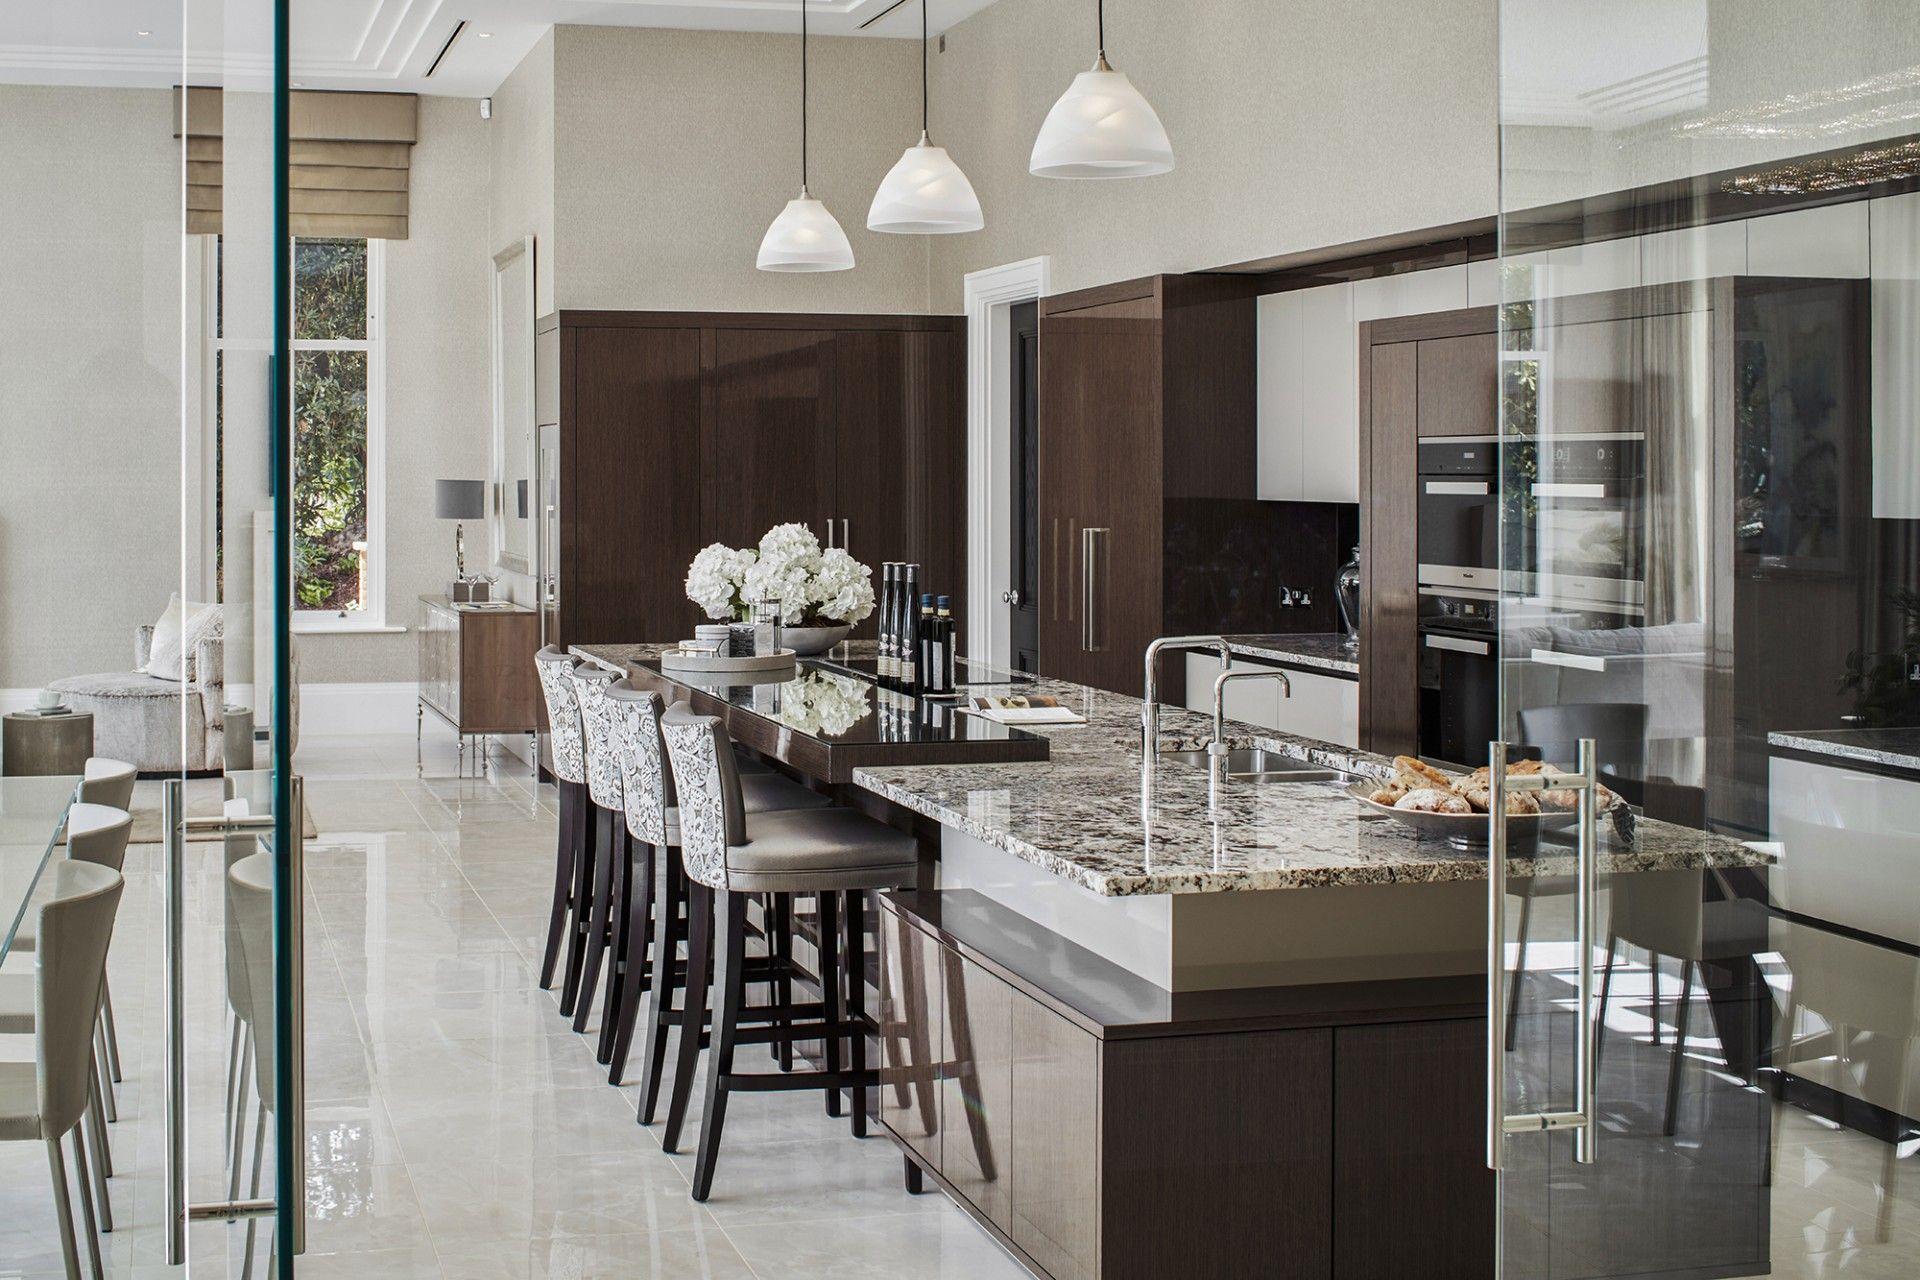 Extreme Kitchens | House plans | Pinterest | Kitchens, Kitchen ...